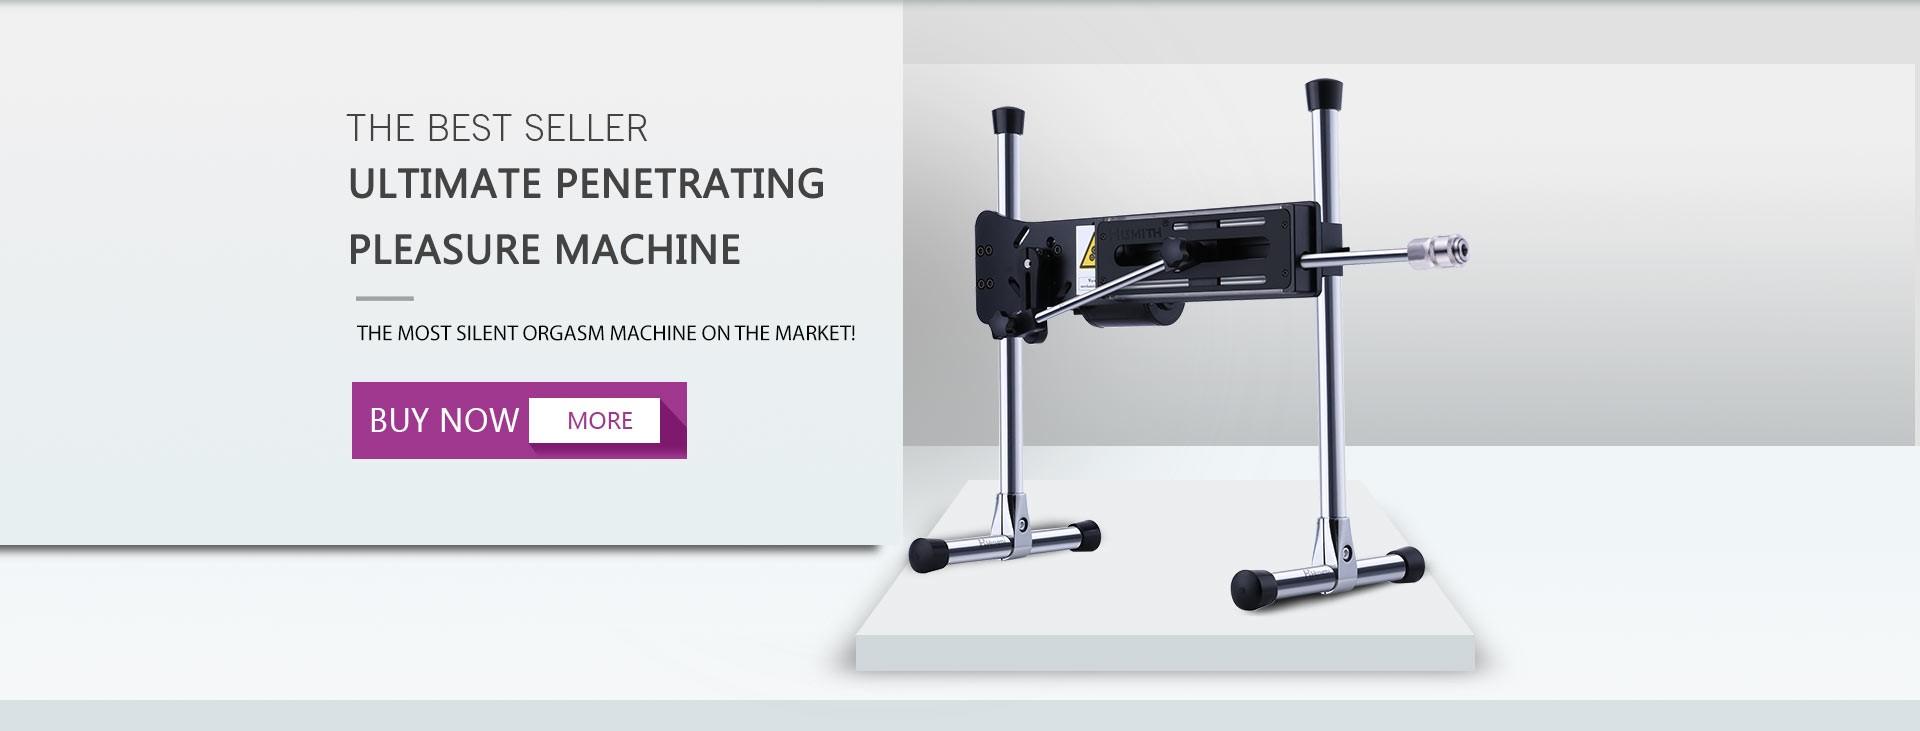 Hismith Premium Machine